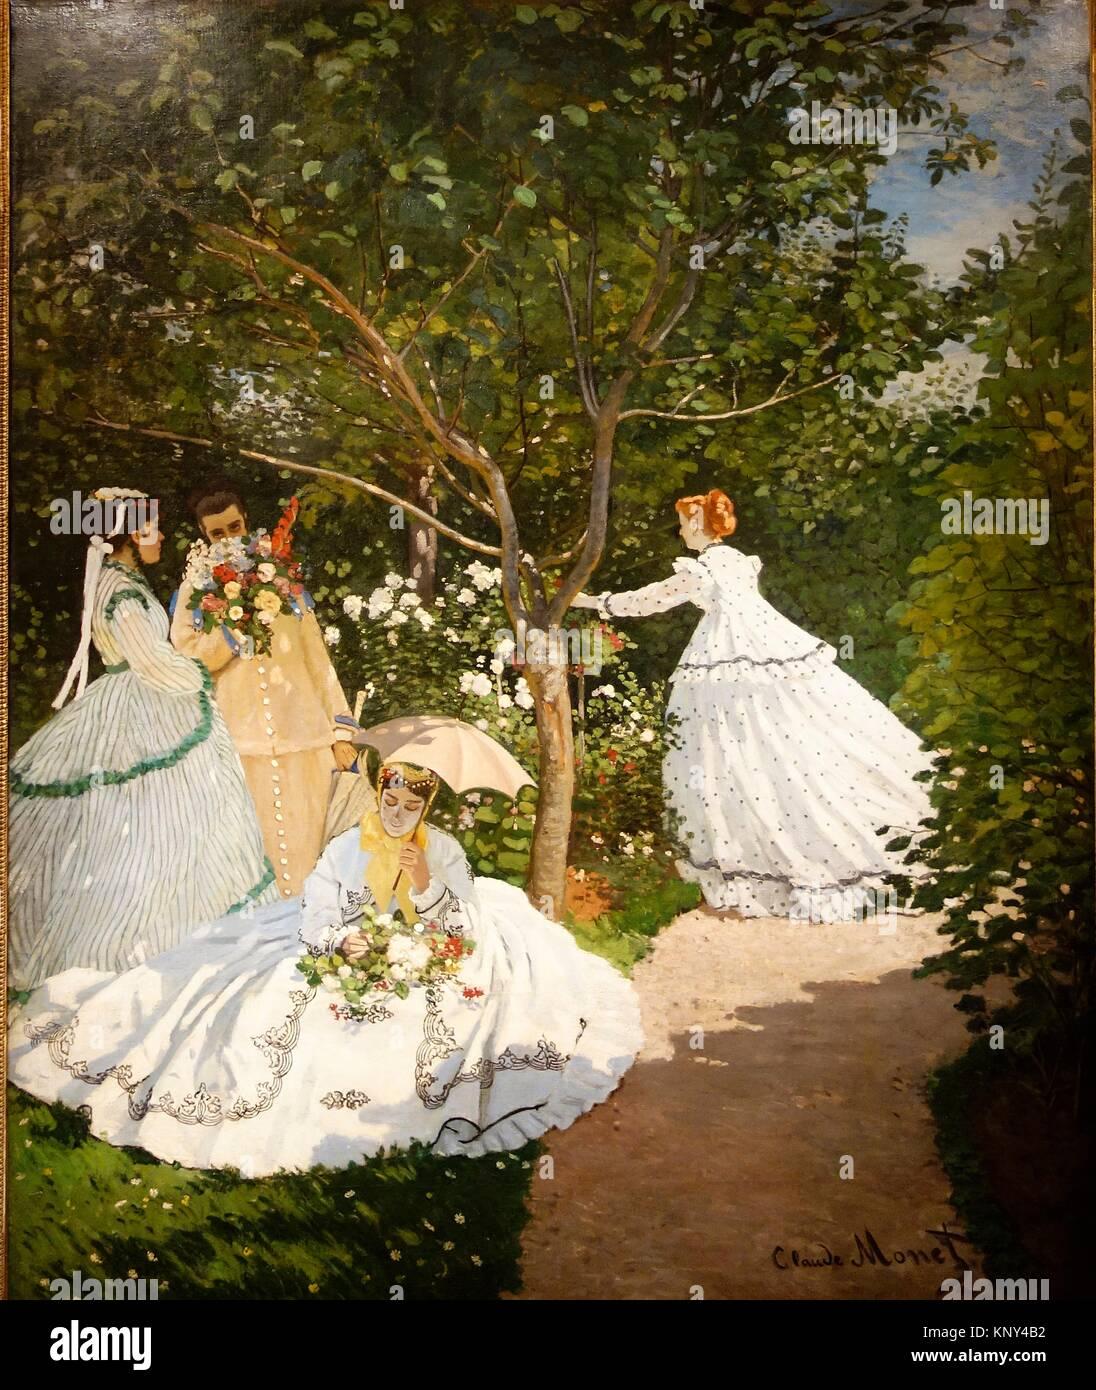 Femmes au jardin stock photos femmes au jardin stock for Au jardin paris